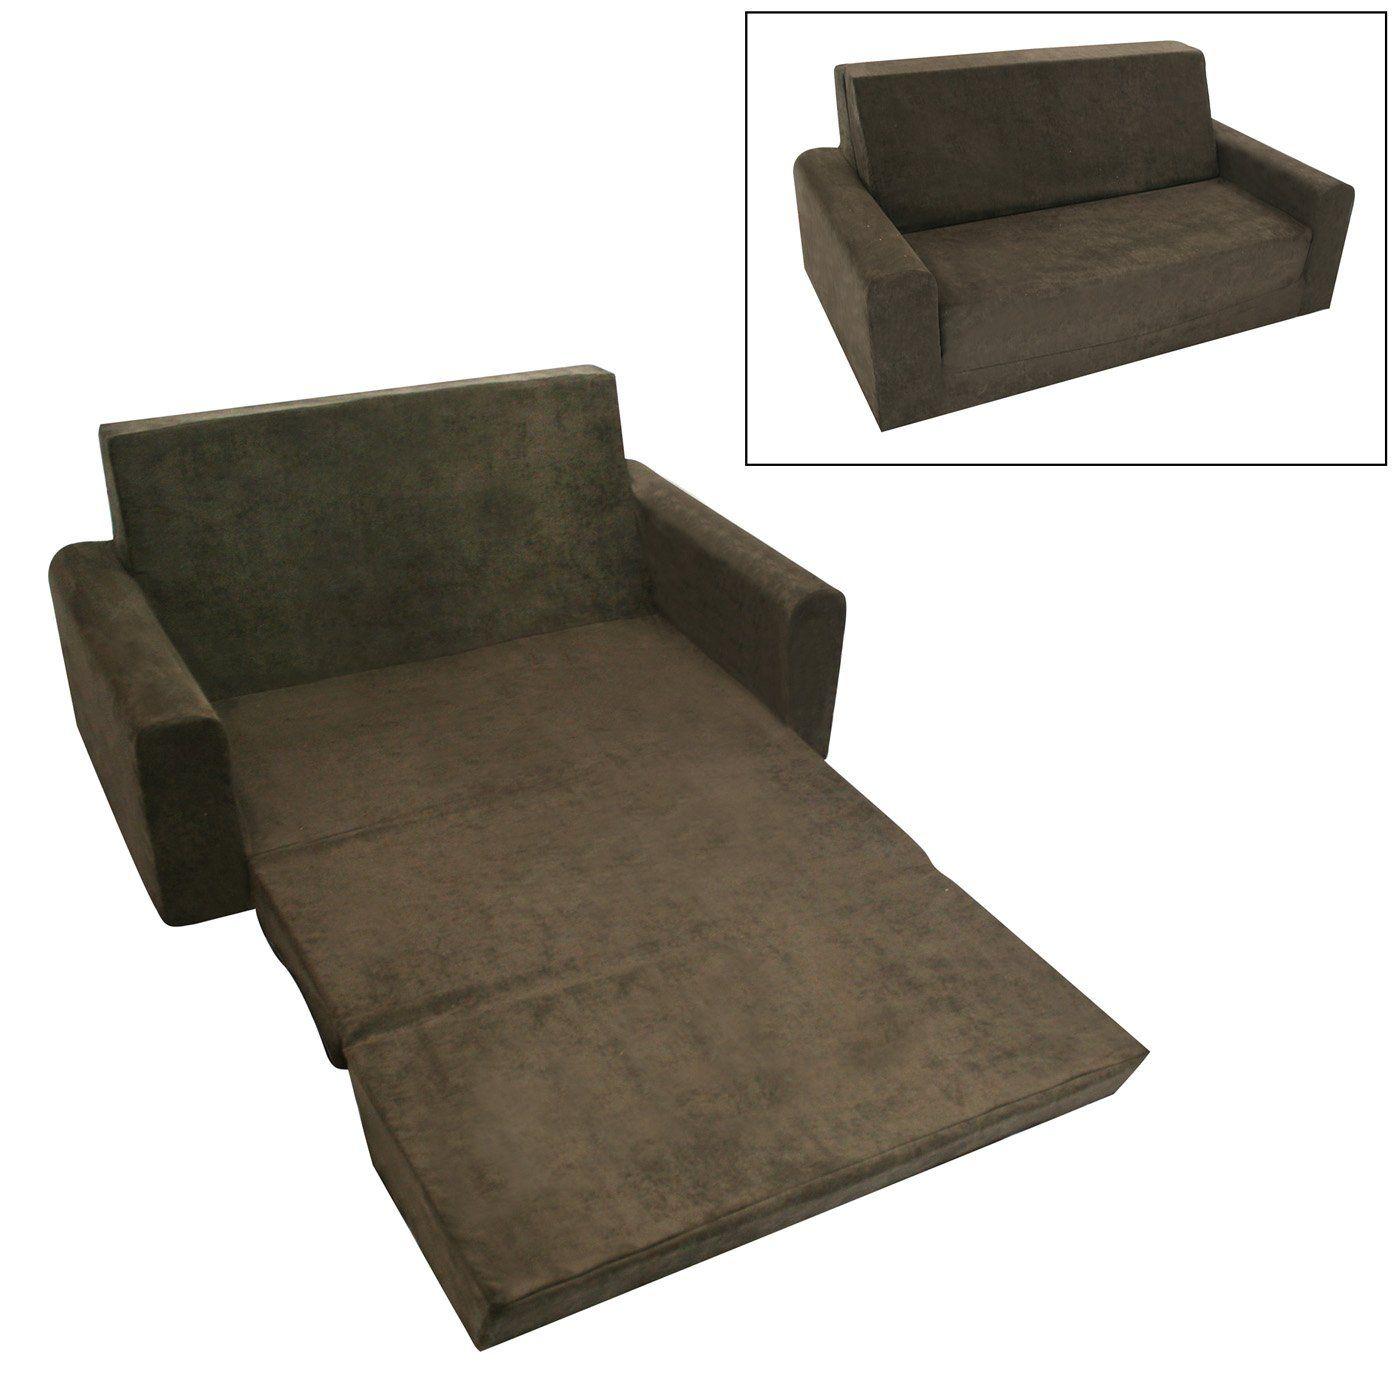 Komfy Kings Inc 70133 Flip Sofa At Atg S Ideas For